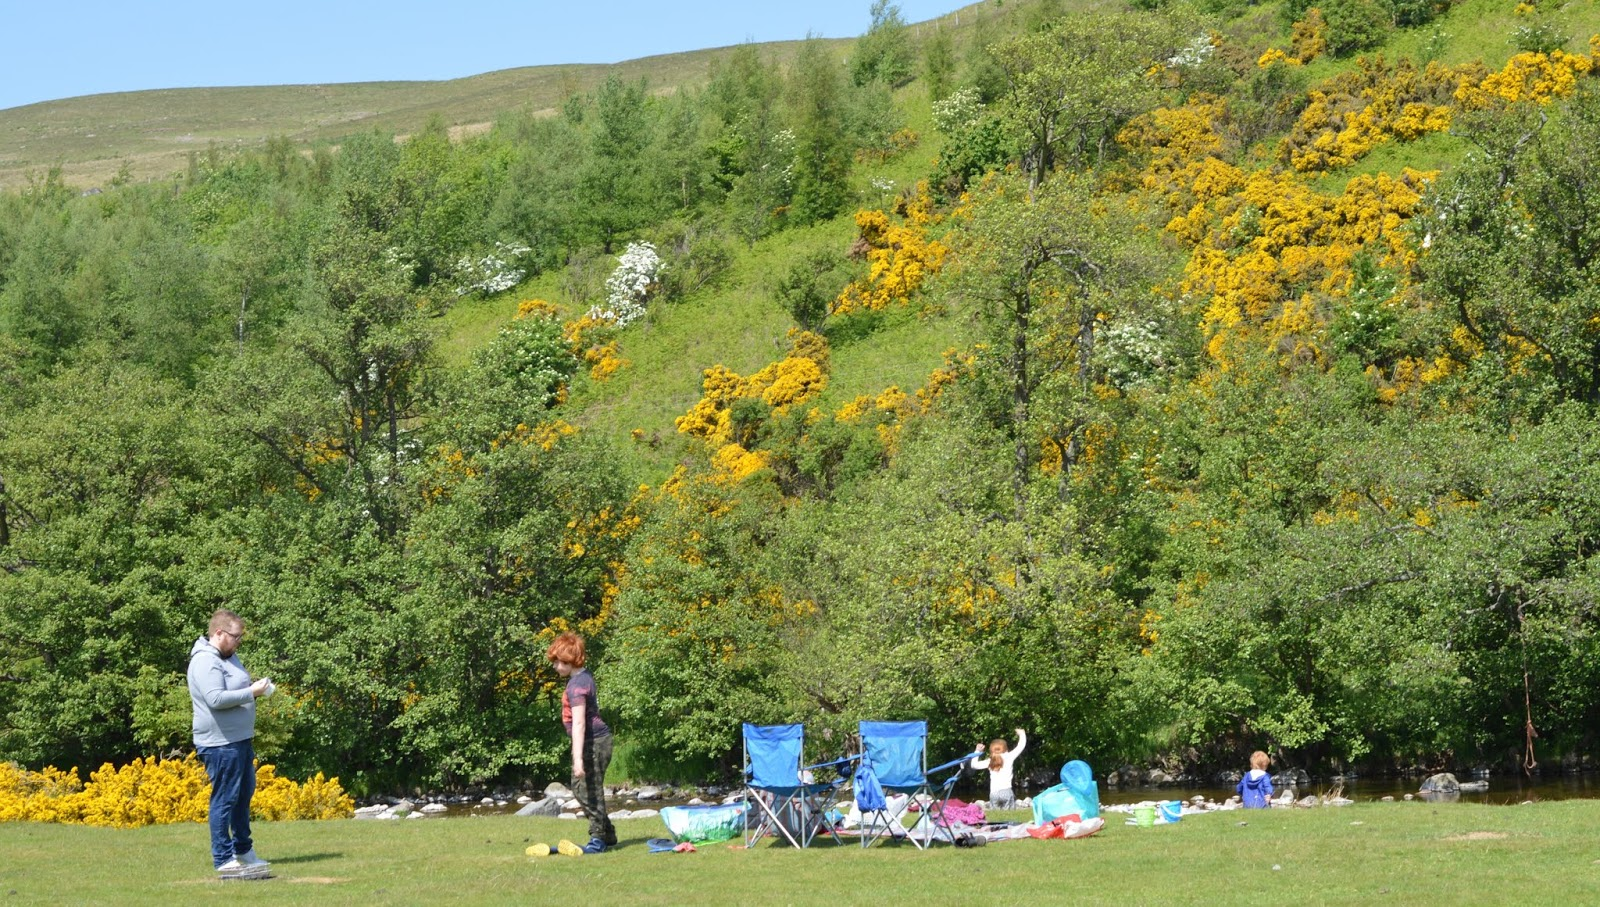 5 of the Best Family Picnic Spots in North East England   #EnglishTourismWeek19 - Ingram Valley